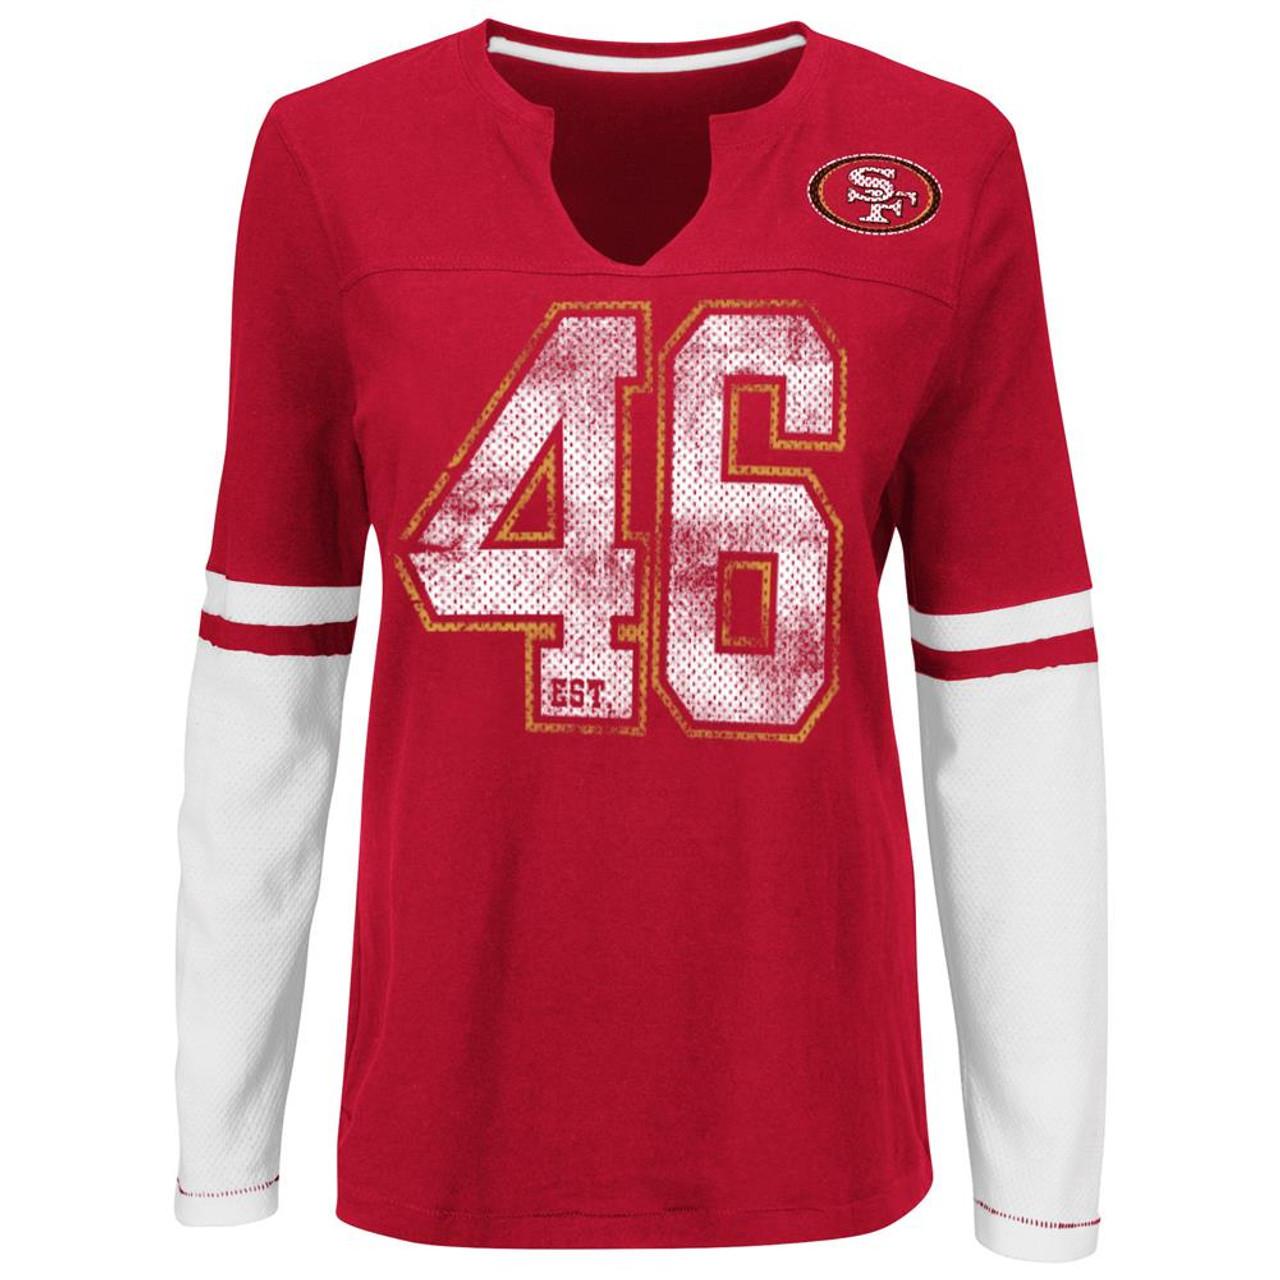 4a1fc6a8f Womens 49er Jersey - Nils Stucki Kieferorthopäde